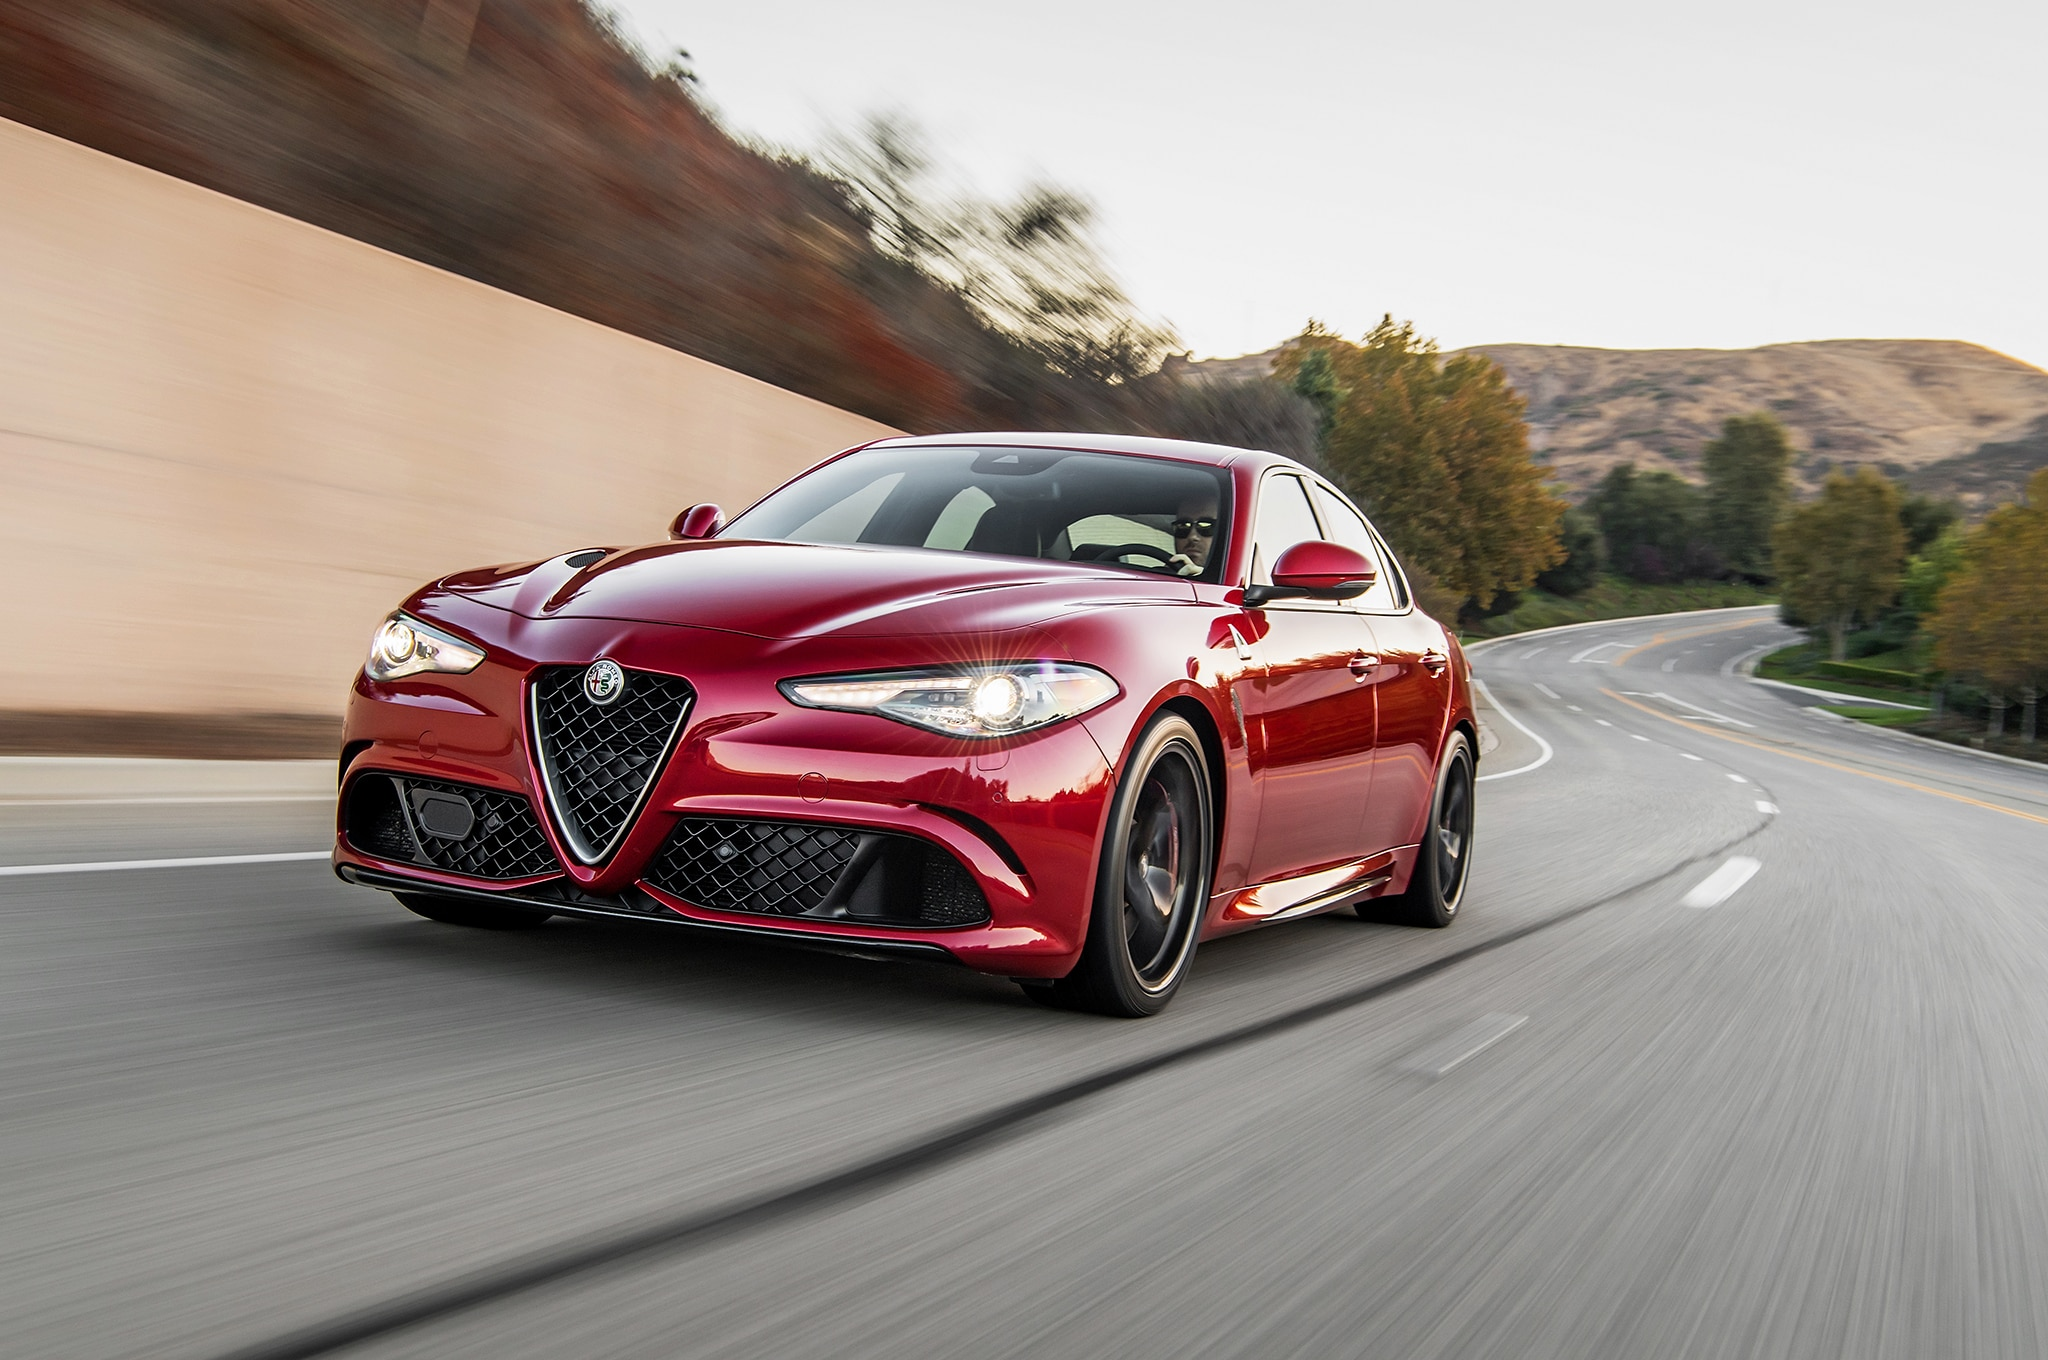 2017 Alfa Romeo Giulia Front Three Quarter In Motion 01